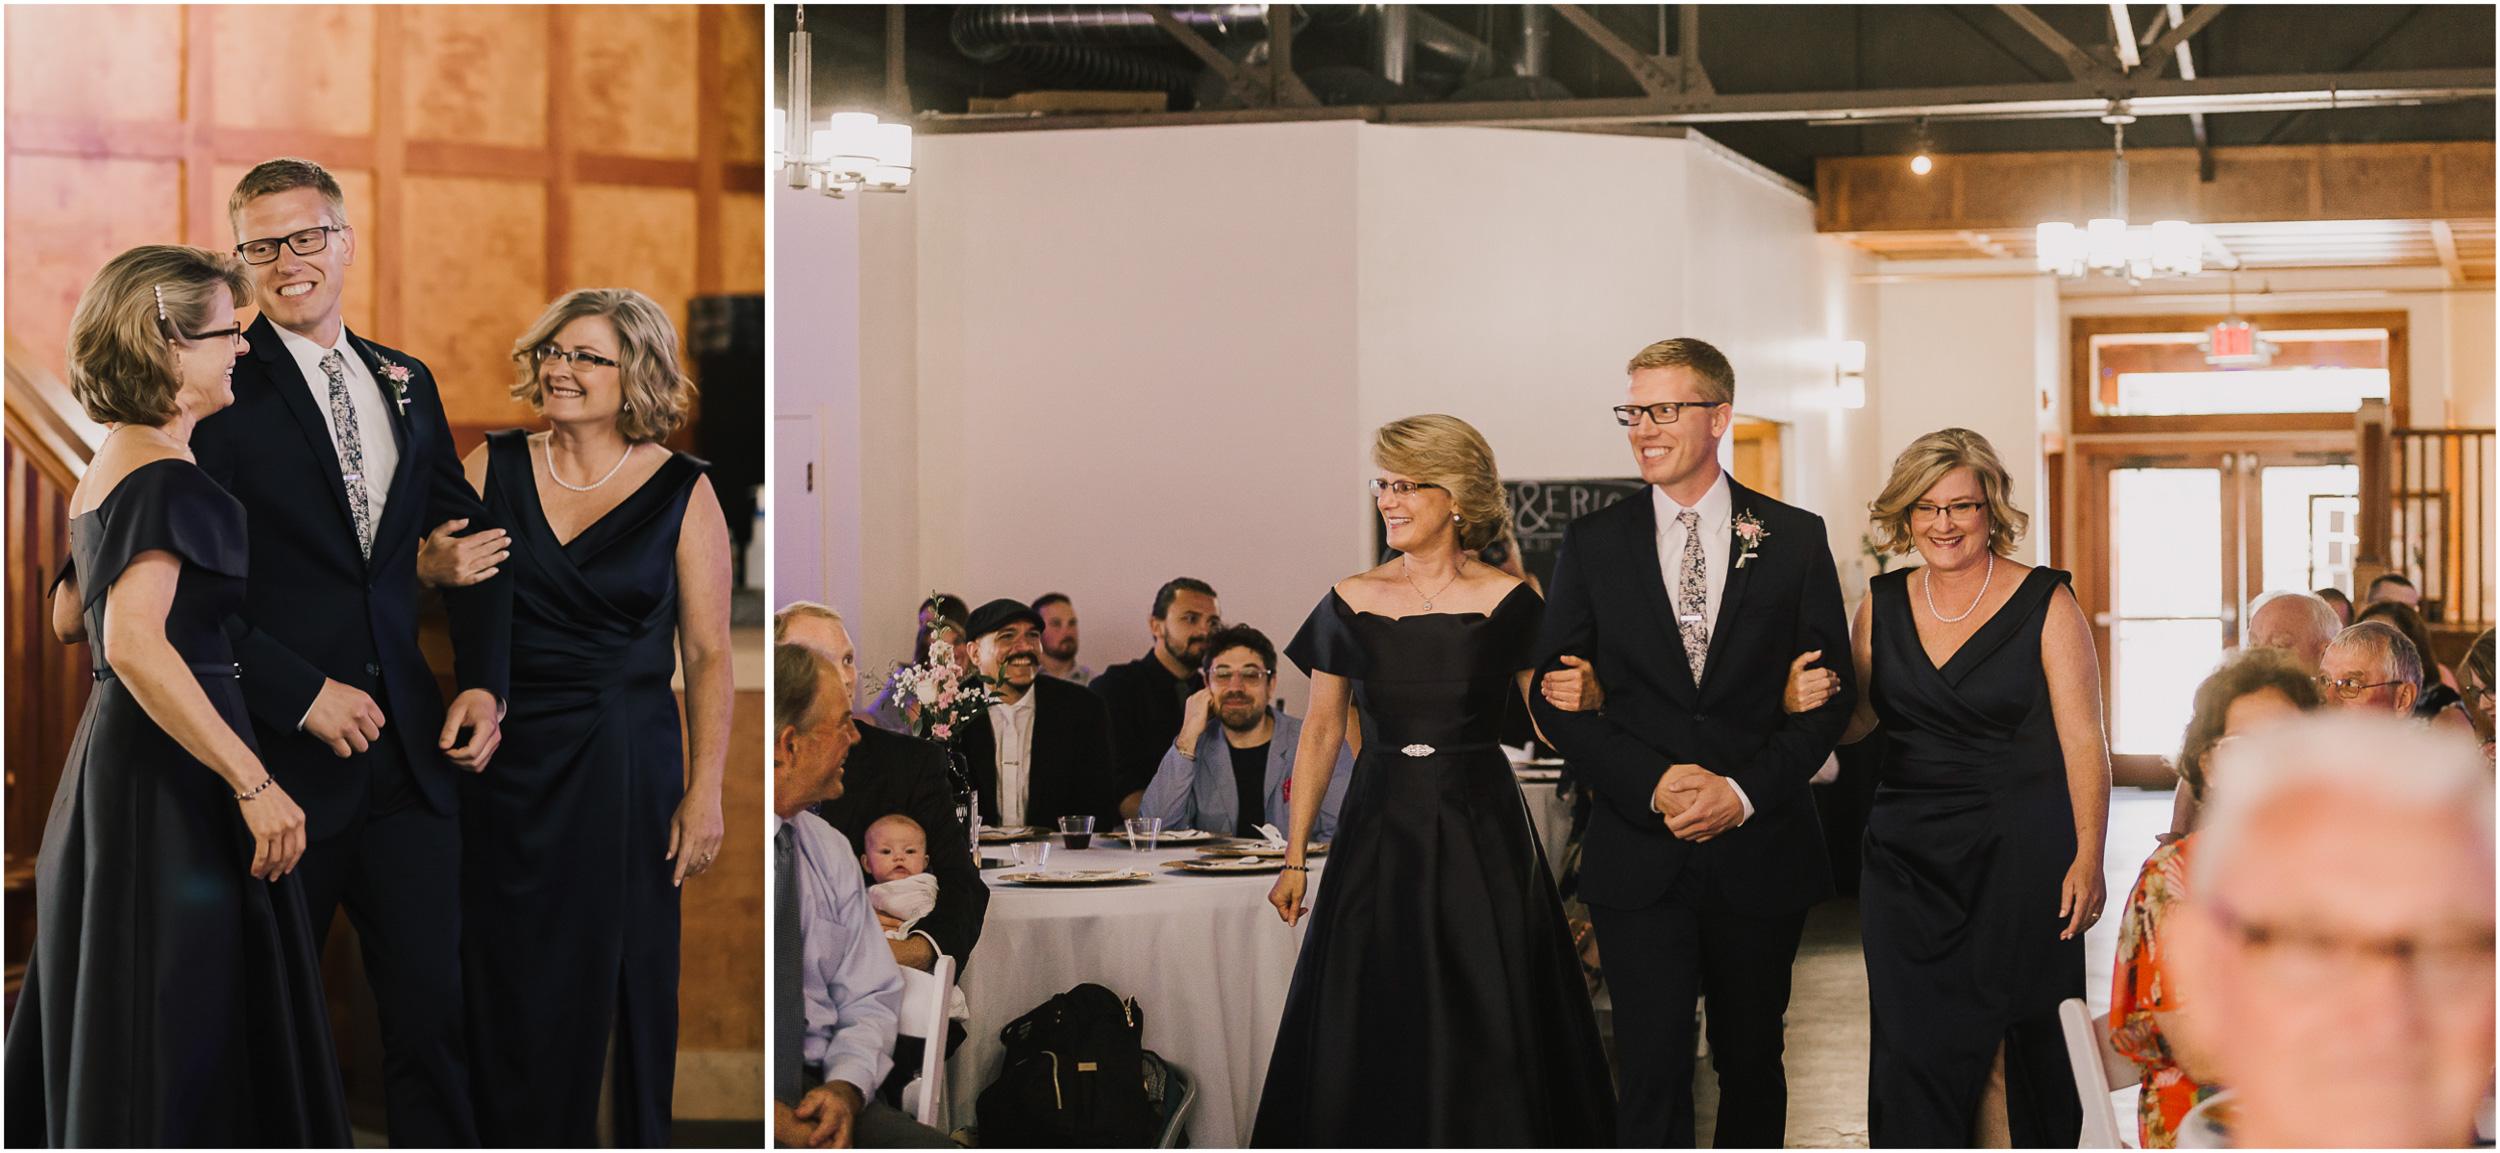 alyssa barletter photography classic kansas city summer wedding photographer dustin and erica king-42.jpg